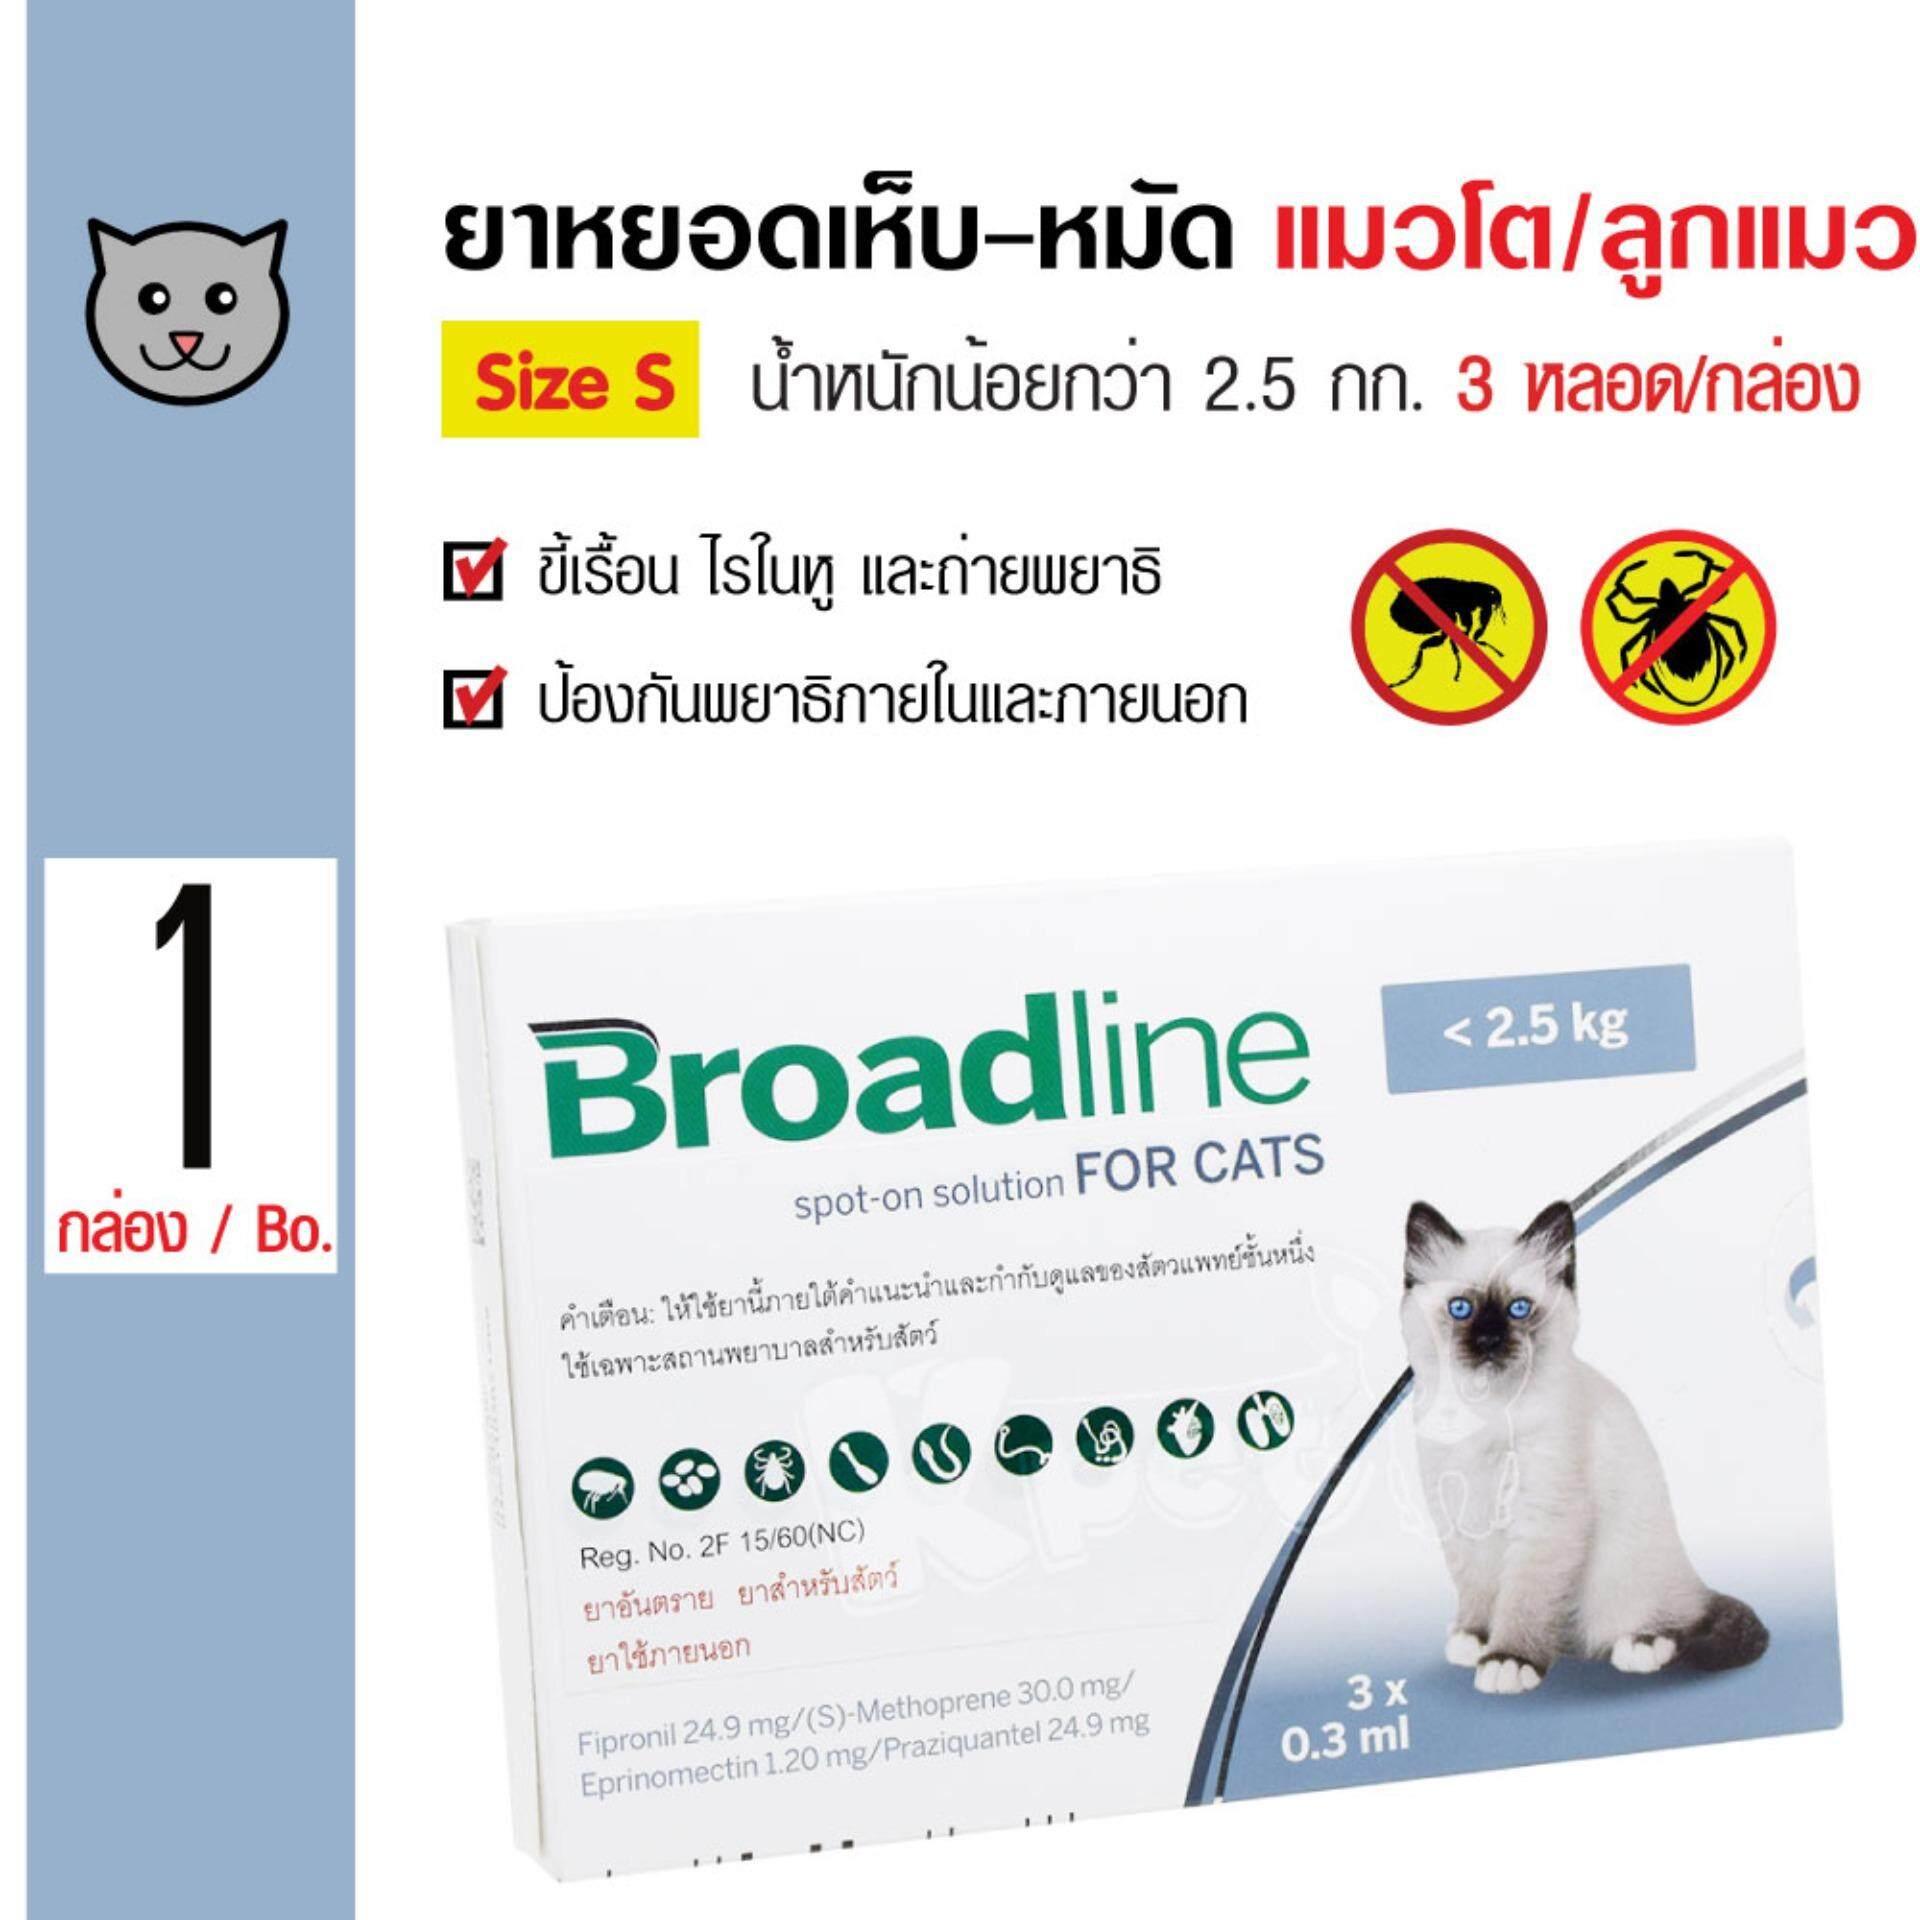 Broadline Cat & Kitten ยาหยอดเห็บ-หมัด ขี้เรื้อน ไรในหู และถ่ายพยาธิ แมวโตและลูกแมวน้ำหนักน้อยกว่า 2.5 กิโลกรัม (3 หลอด/กล่อง) By Kpet.